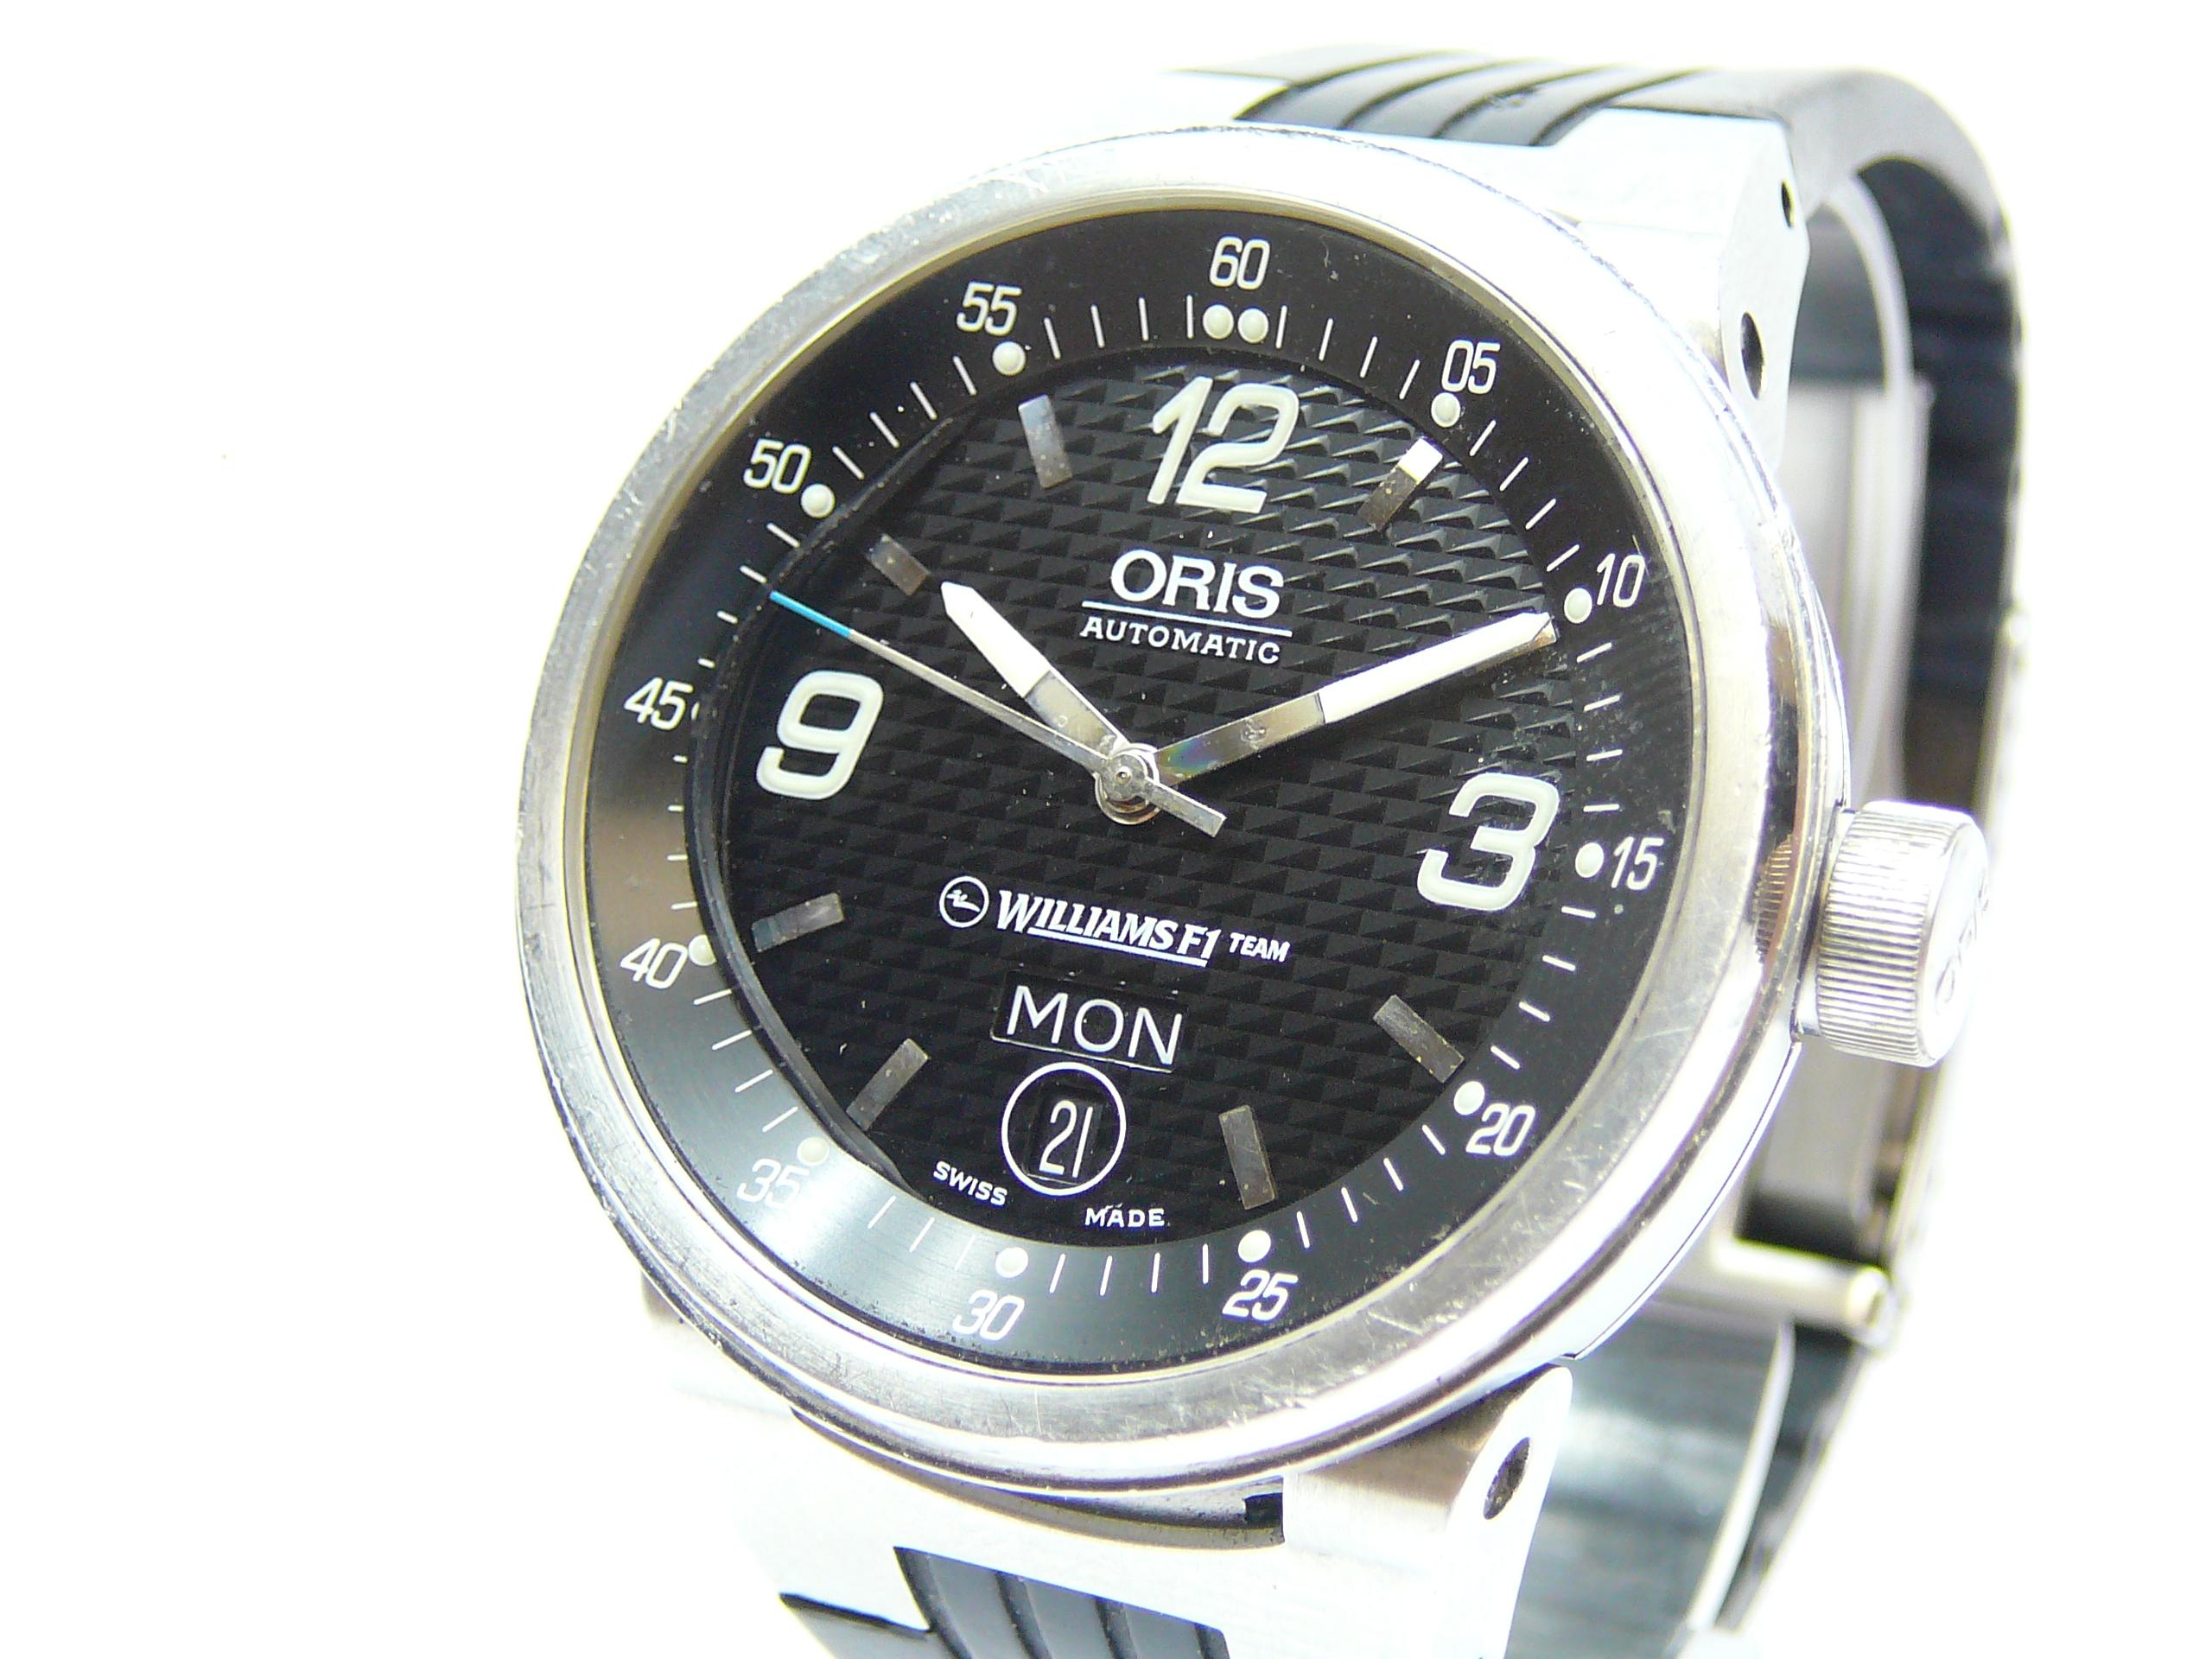 Gents Oris Wrist Watch - Image 2 of 3